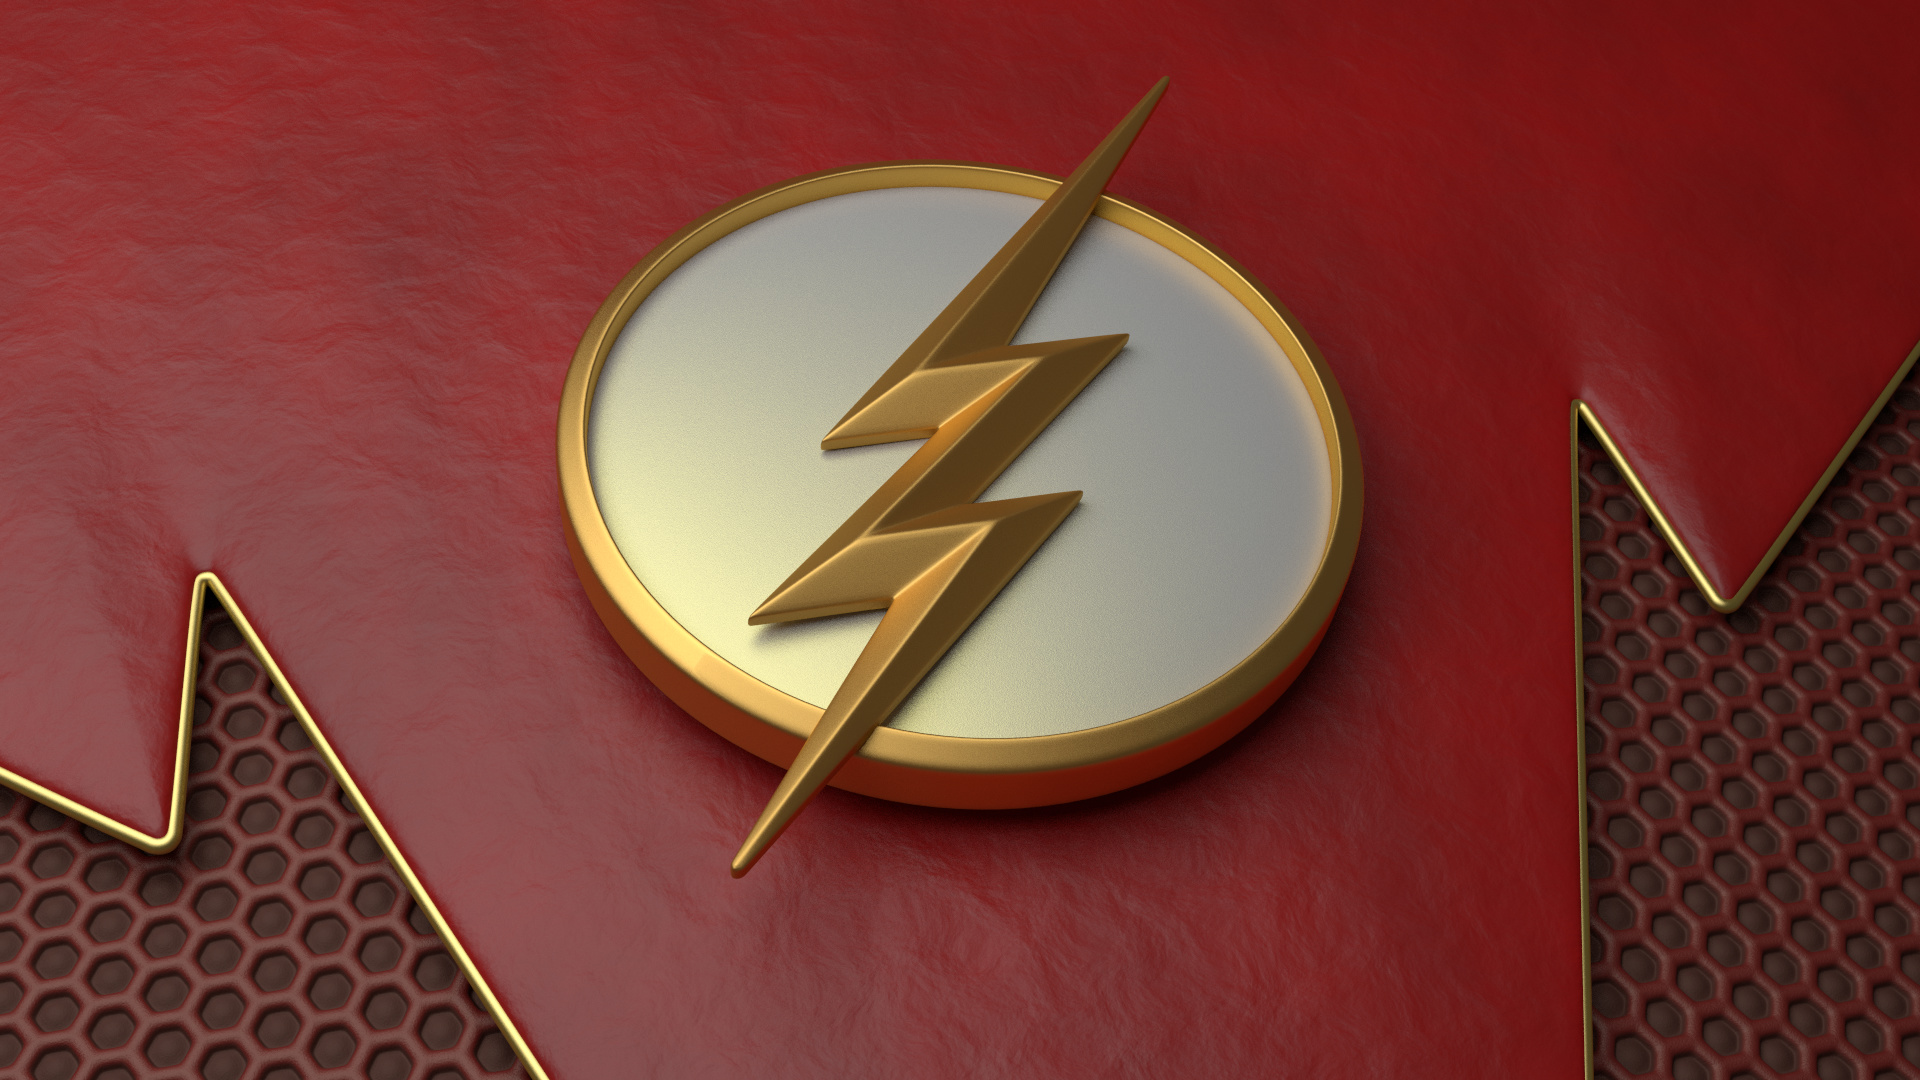 Flash logo wallpaper phone